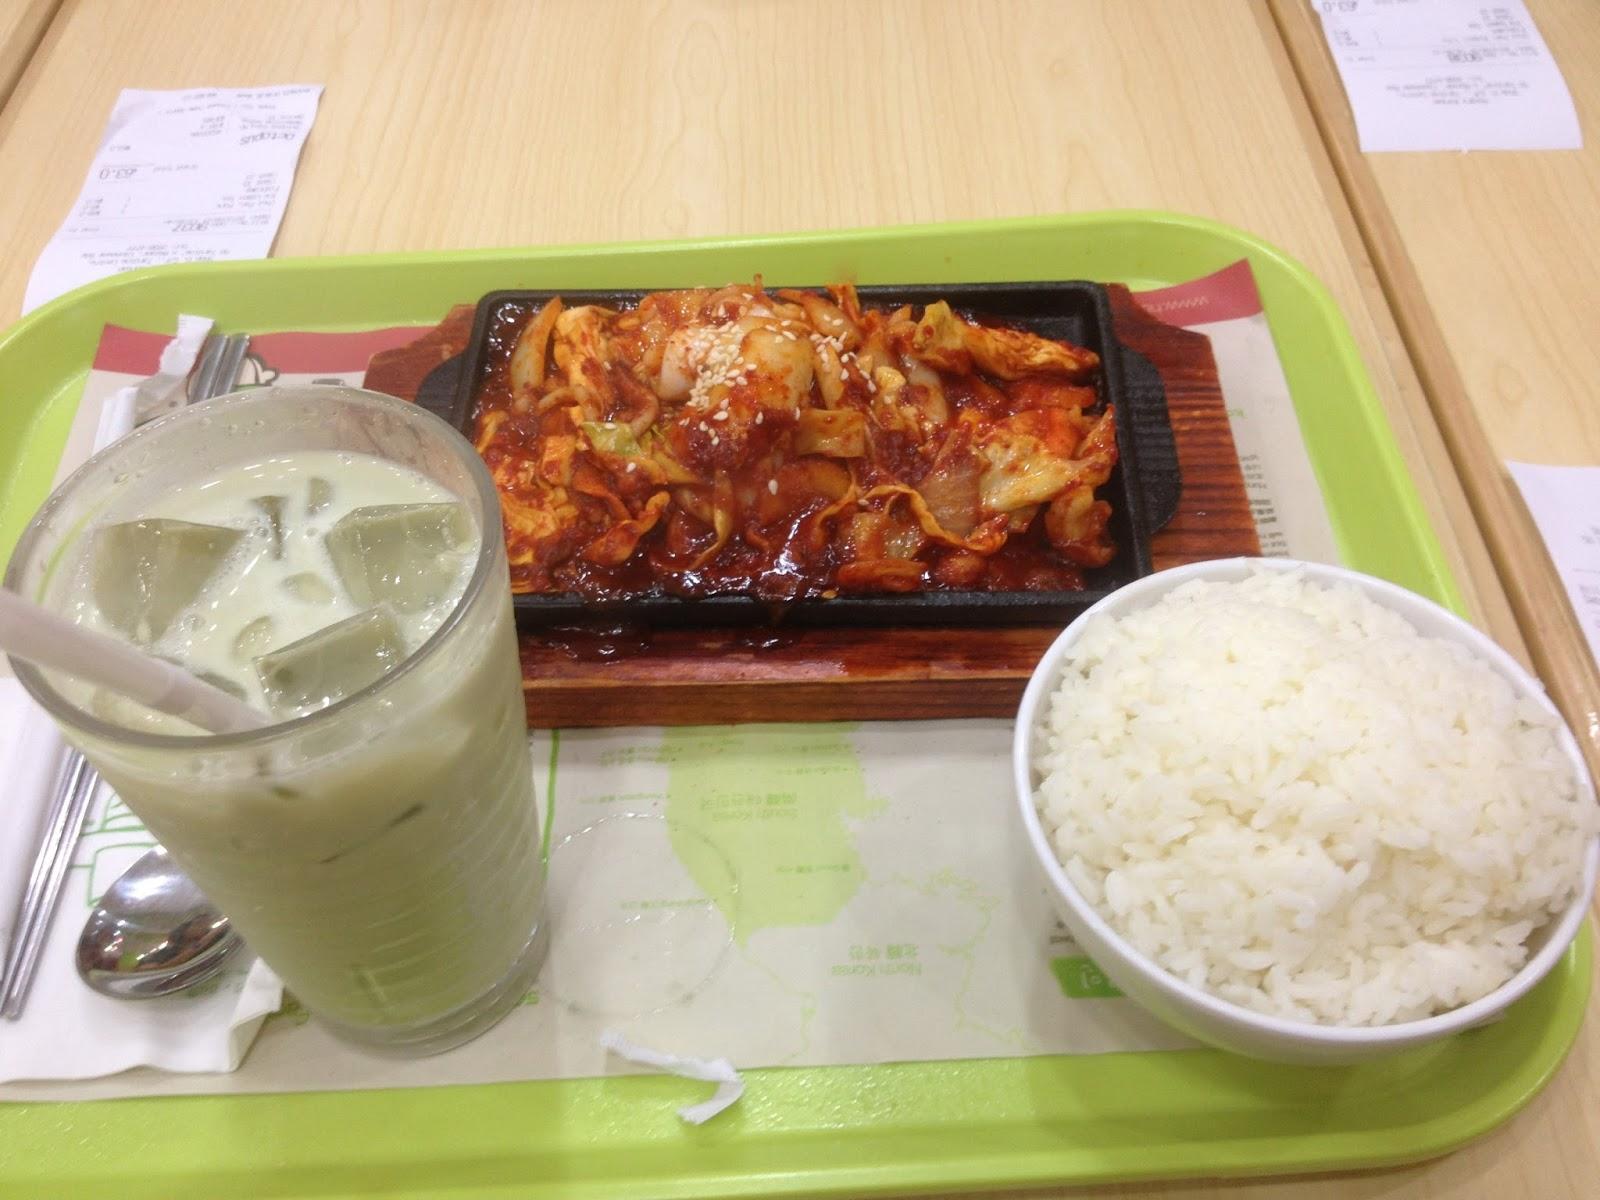 Cammy's Kitchen: 簡而精 – Hungry Korean